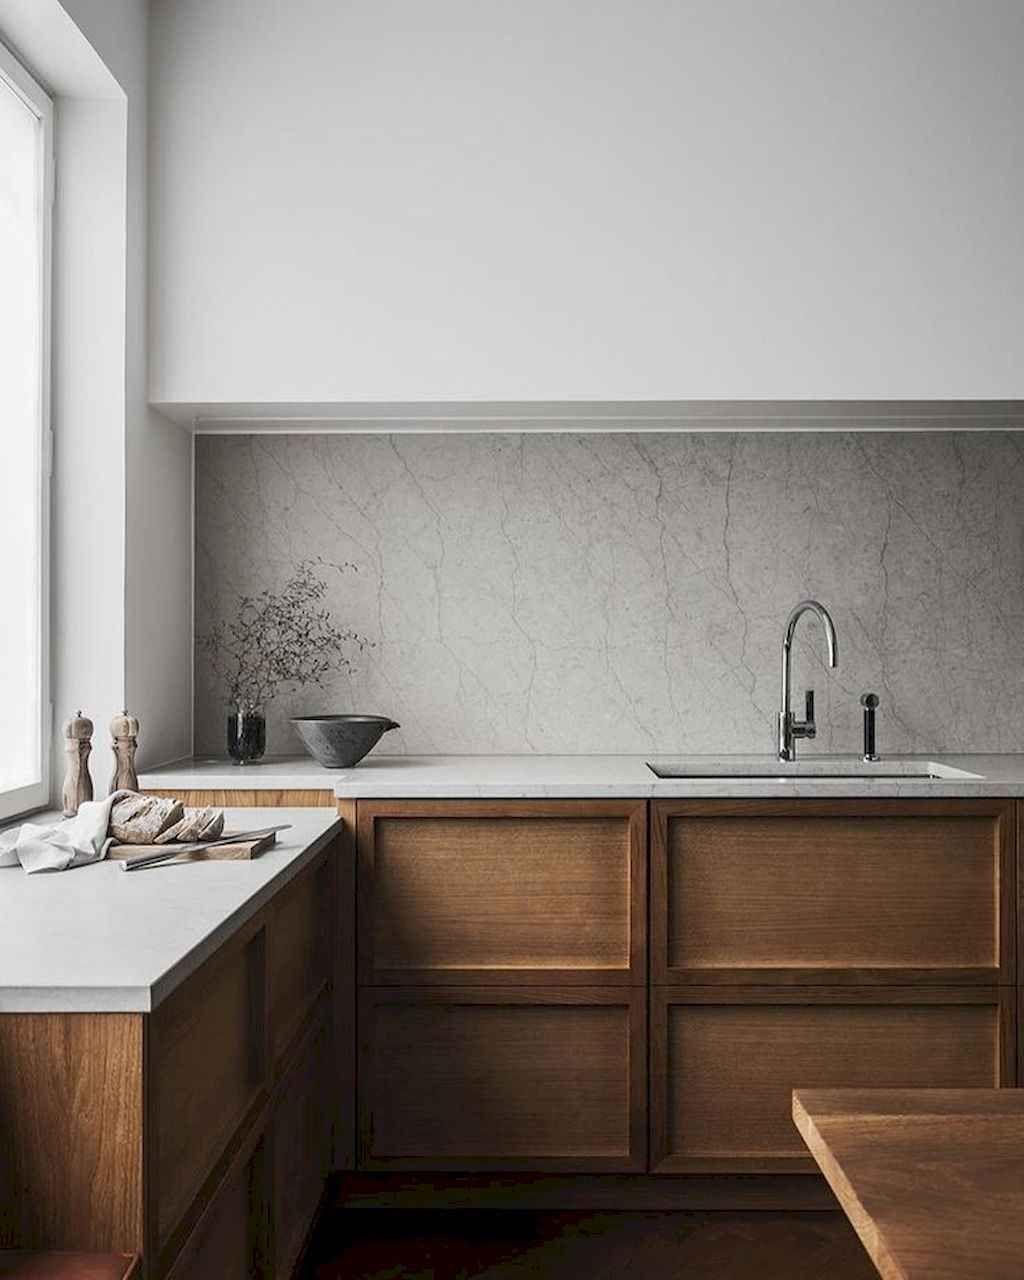 80 Modern Mid Century Kitchen Remodel Ideas - spaciroom.com